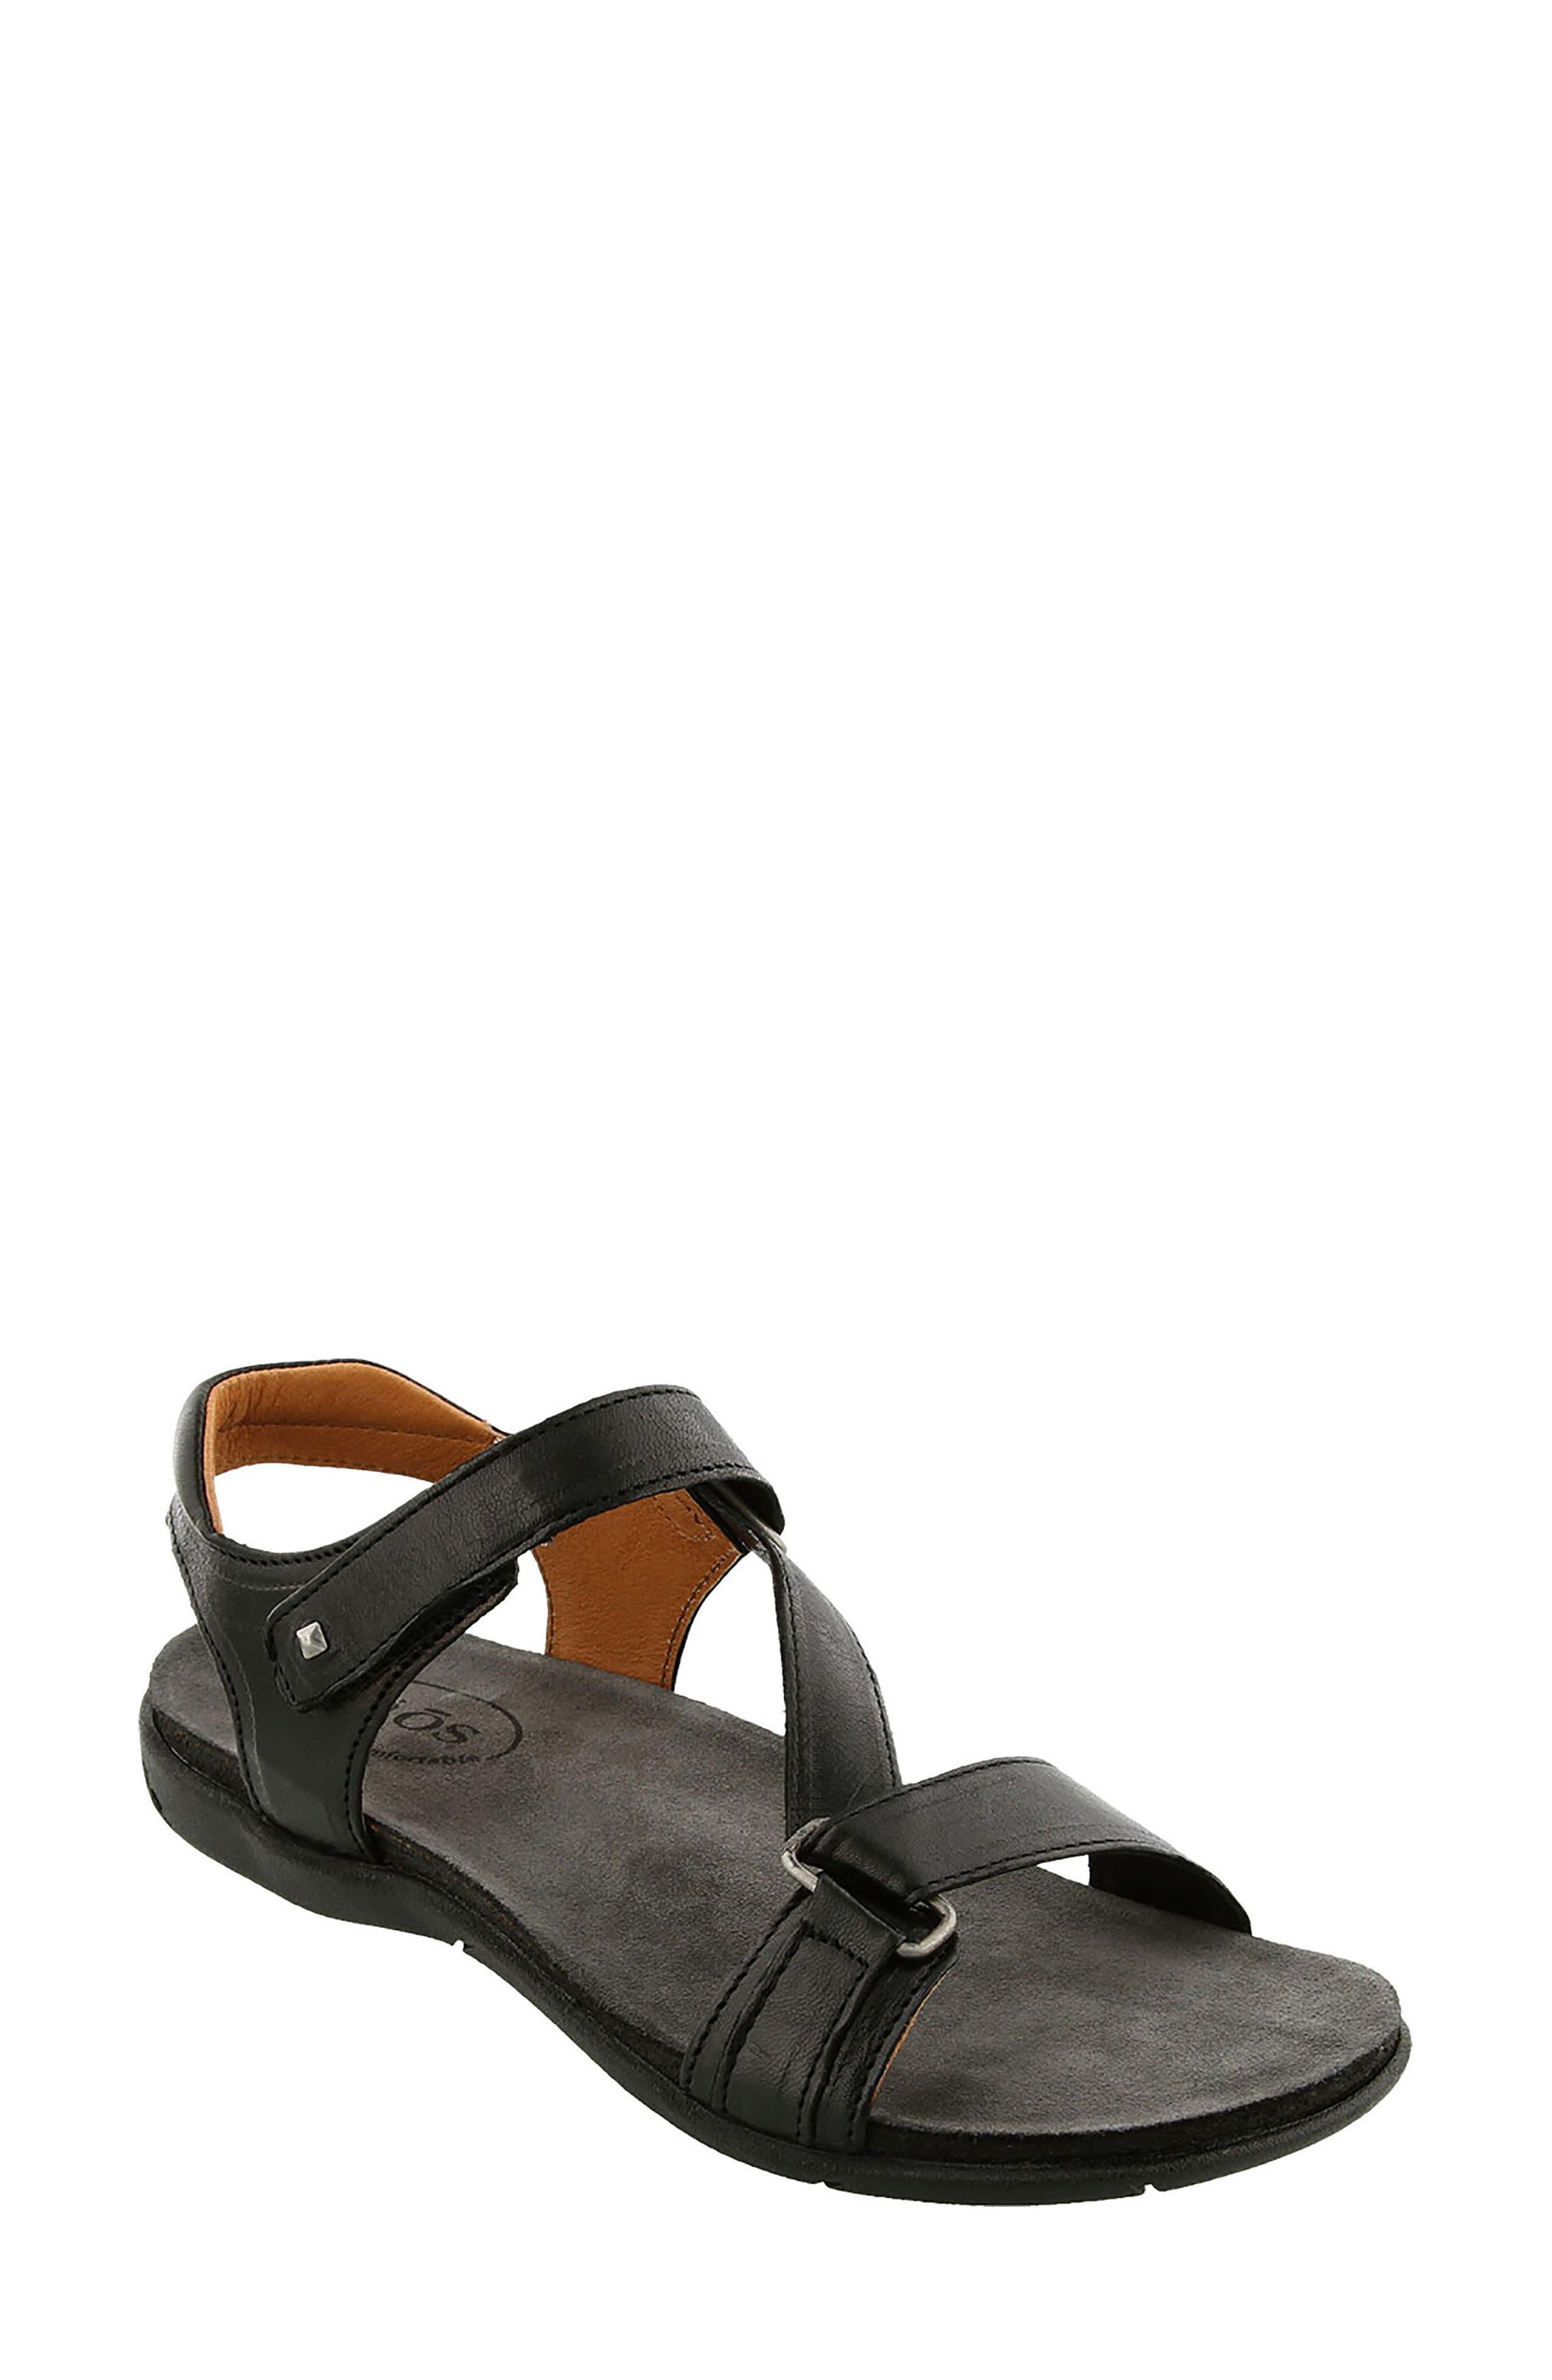 Zeal Sandal,                             Main thumbnail 1, color,                             Black Leather